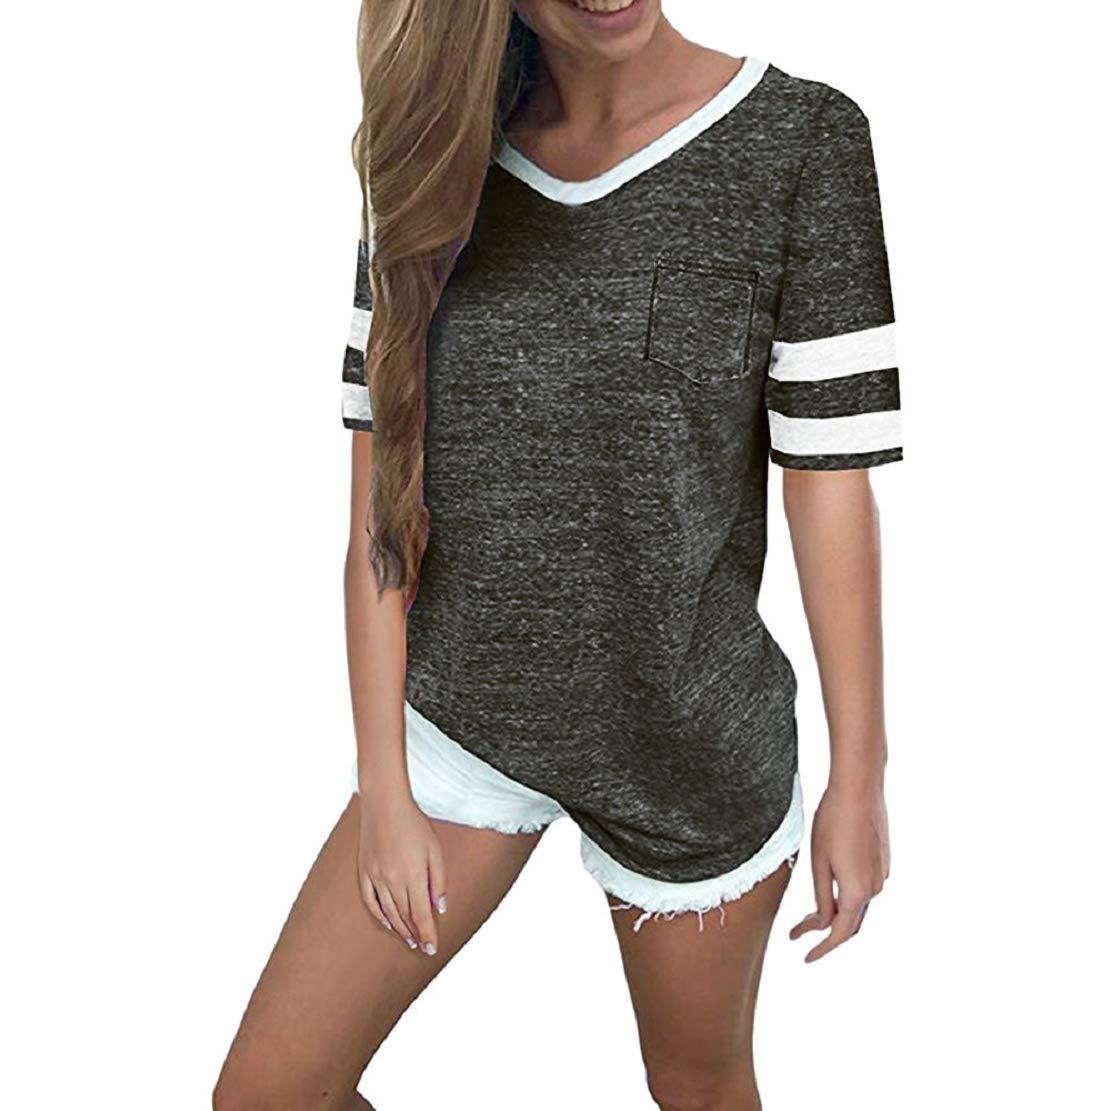 Women Summer Casual Short Sleeve V Neck T Shirt Striped Print Baseball T-Shirt Blouse Tops by Lowprofile Dark Gray